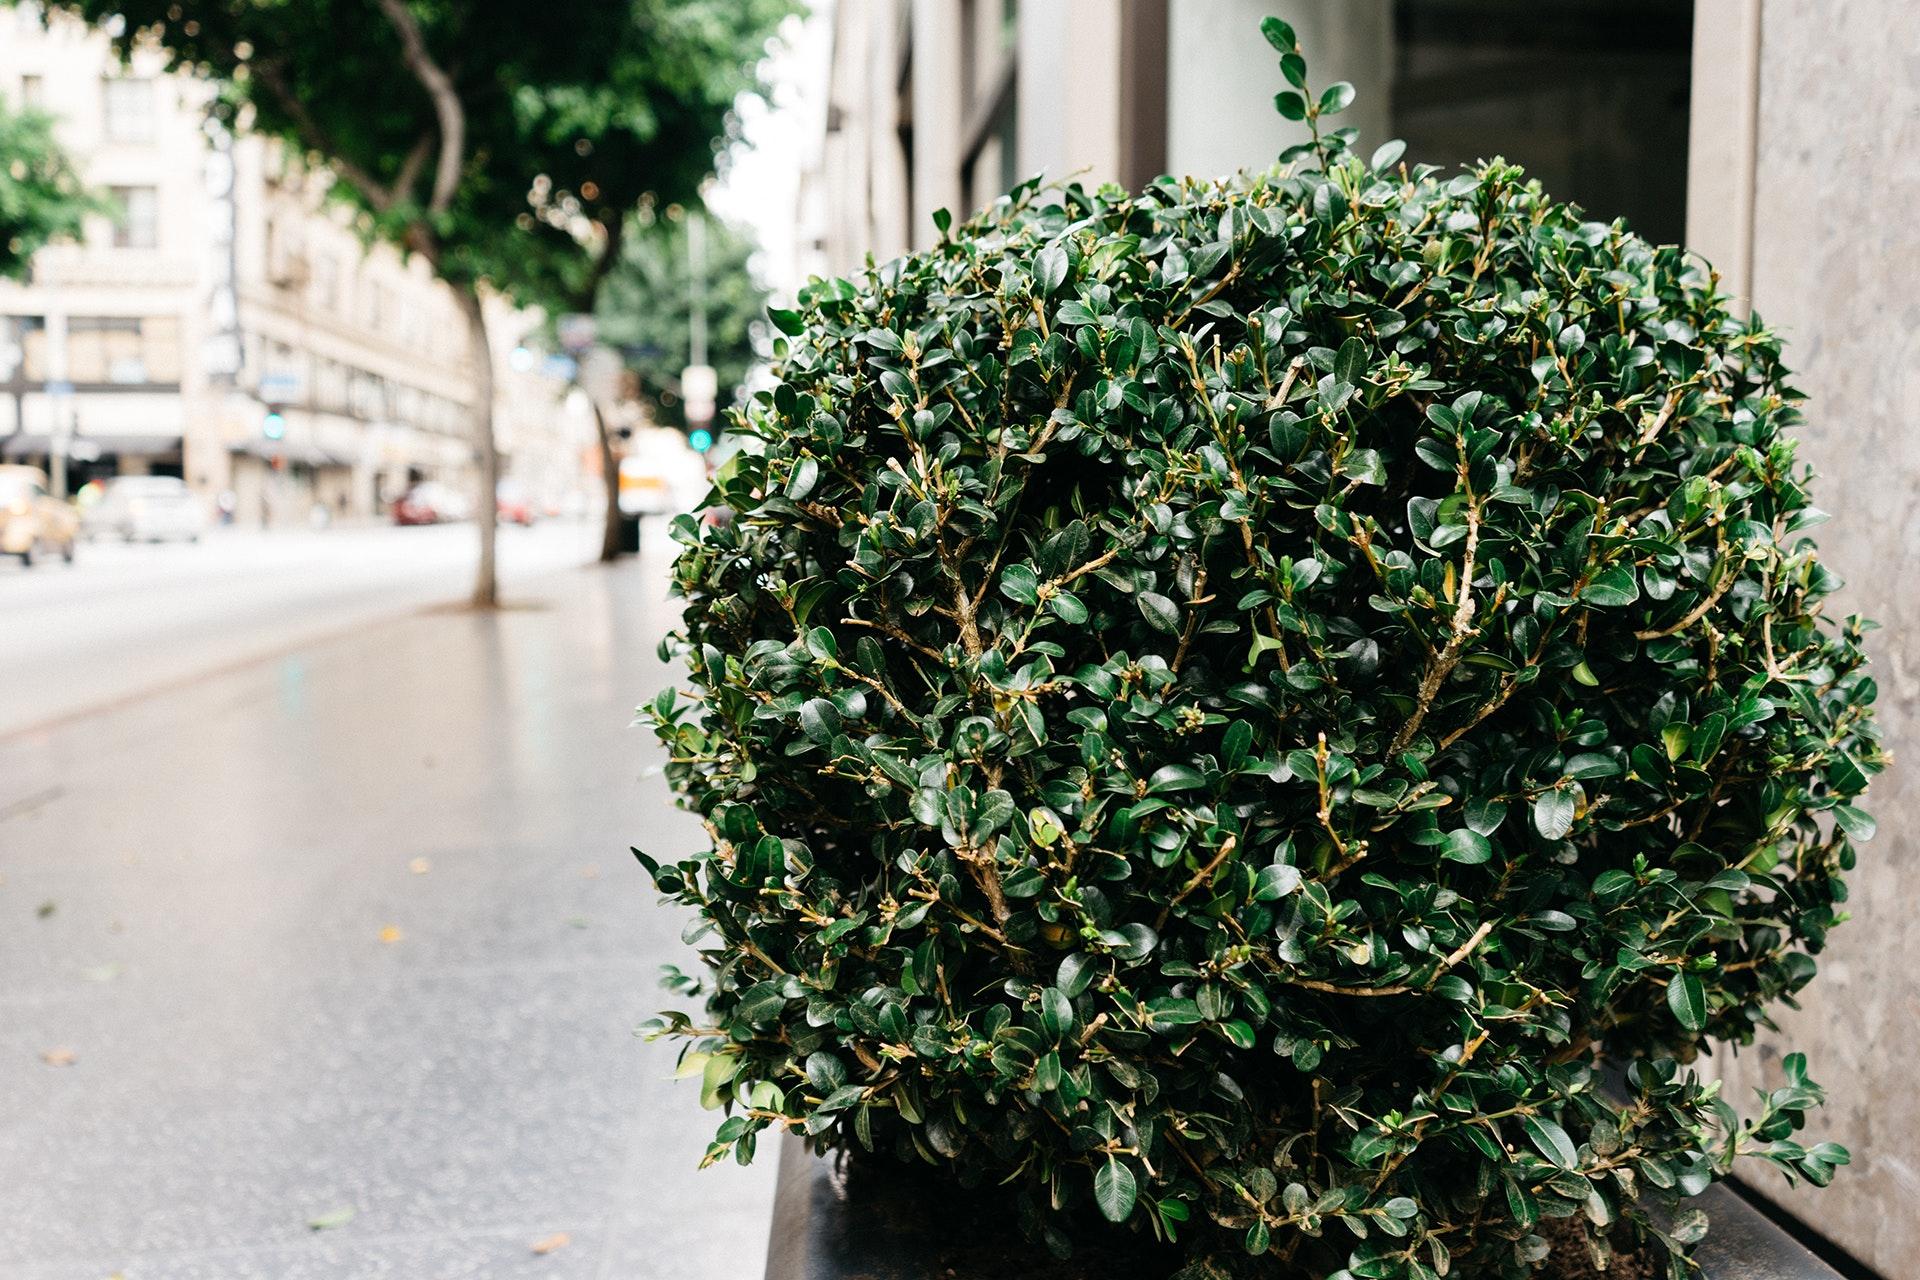 What Living Under a Bush Can Teach You